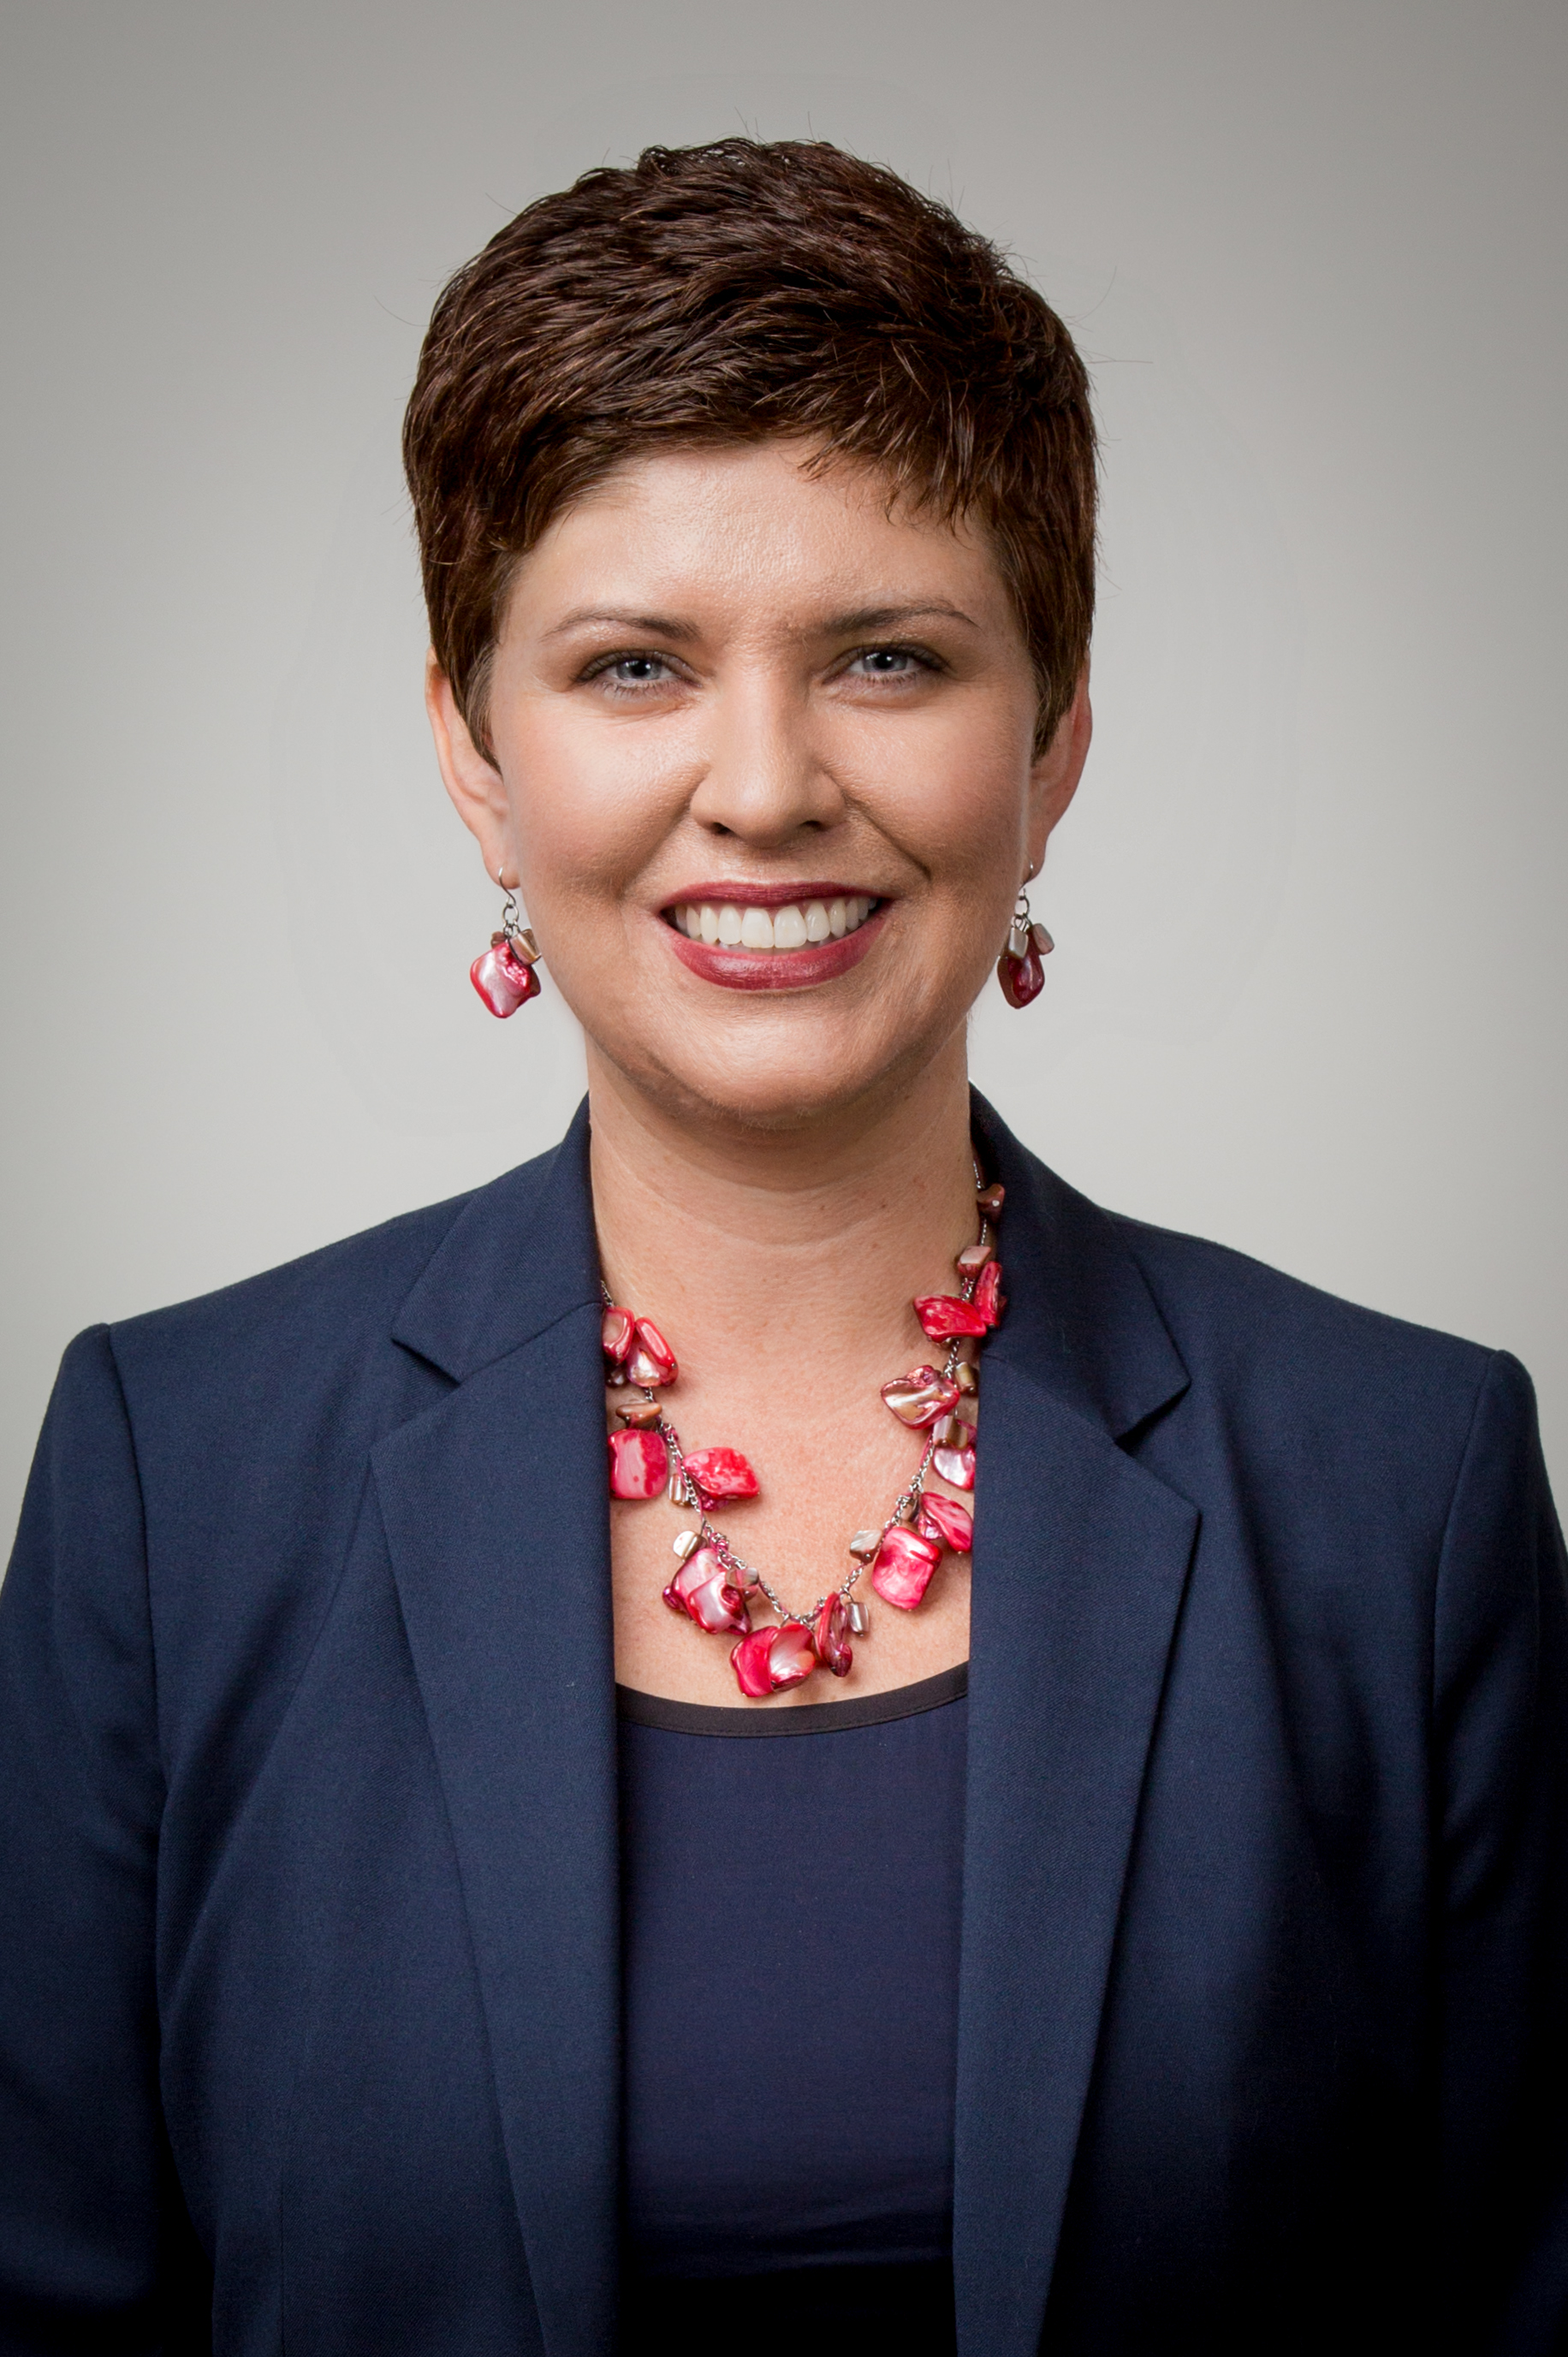 Melinda Jackson Portrait